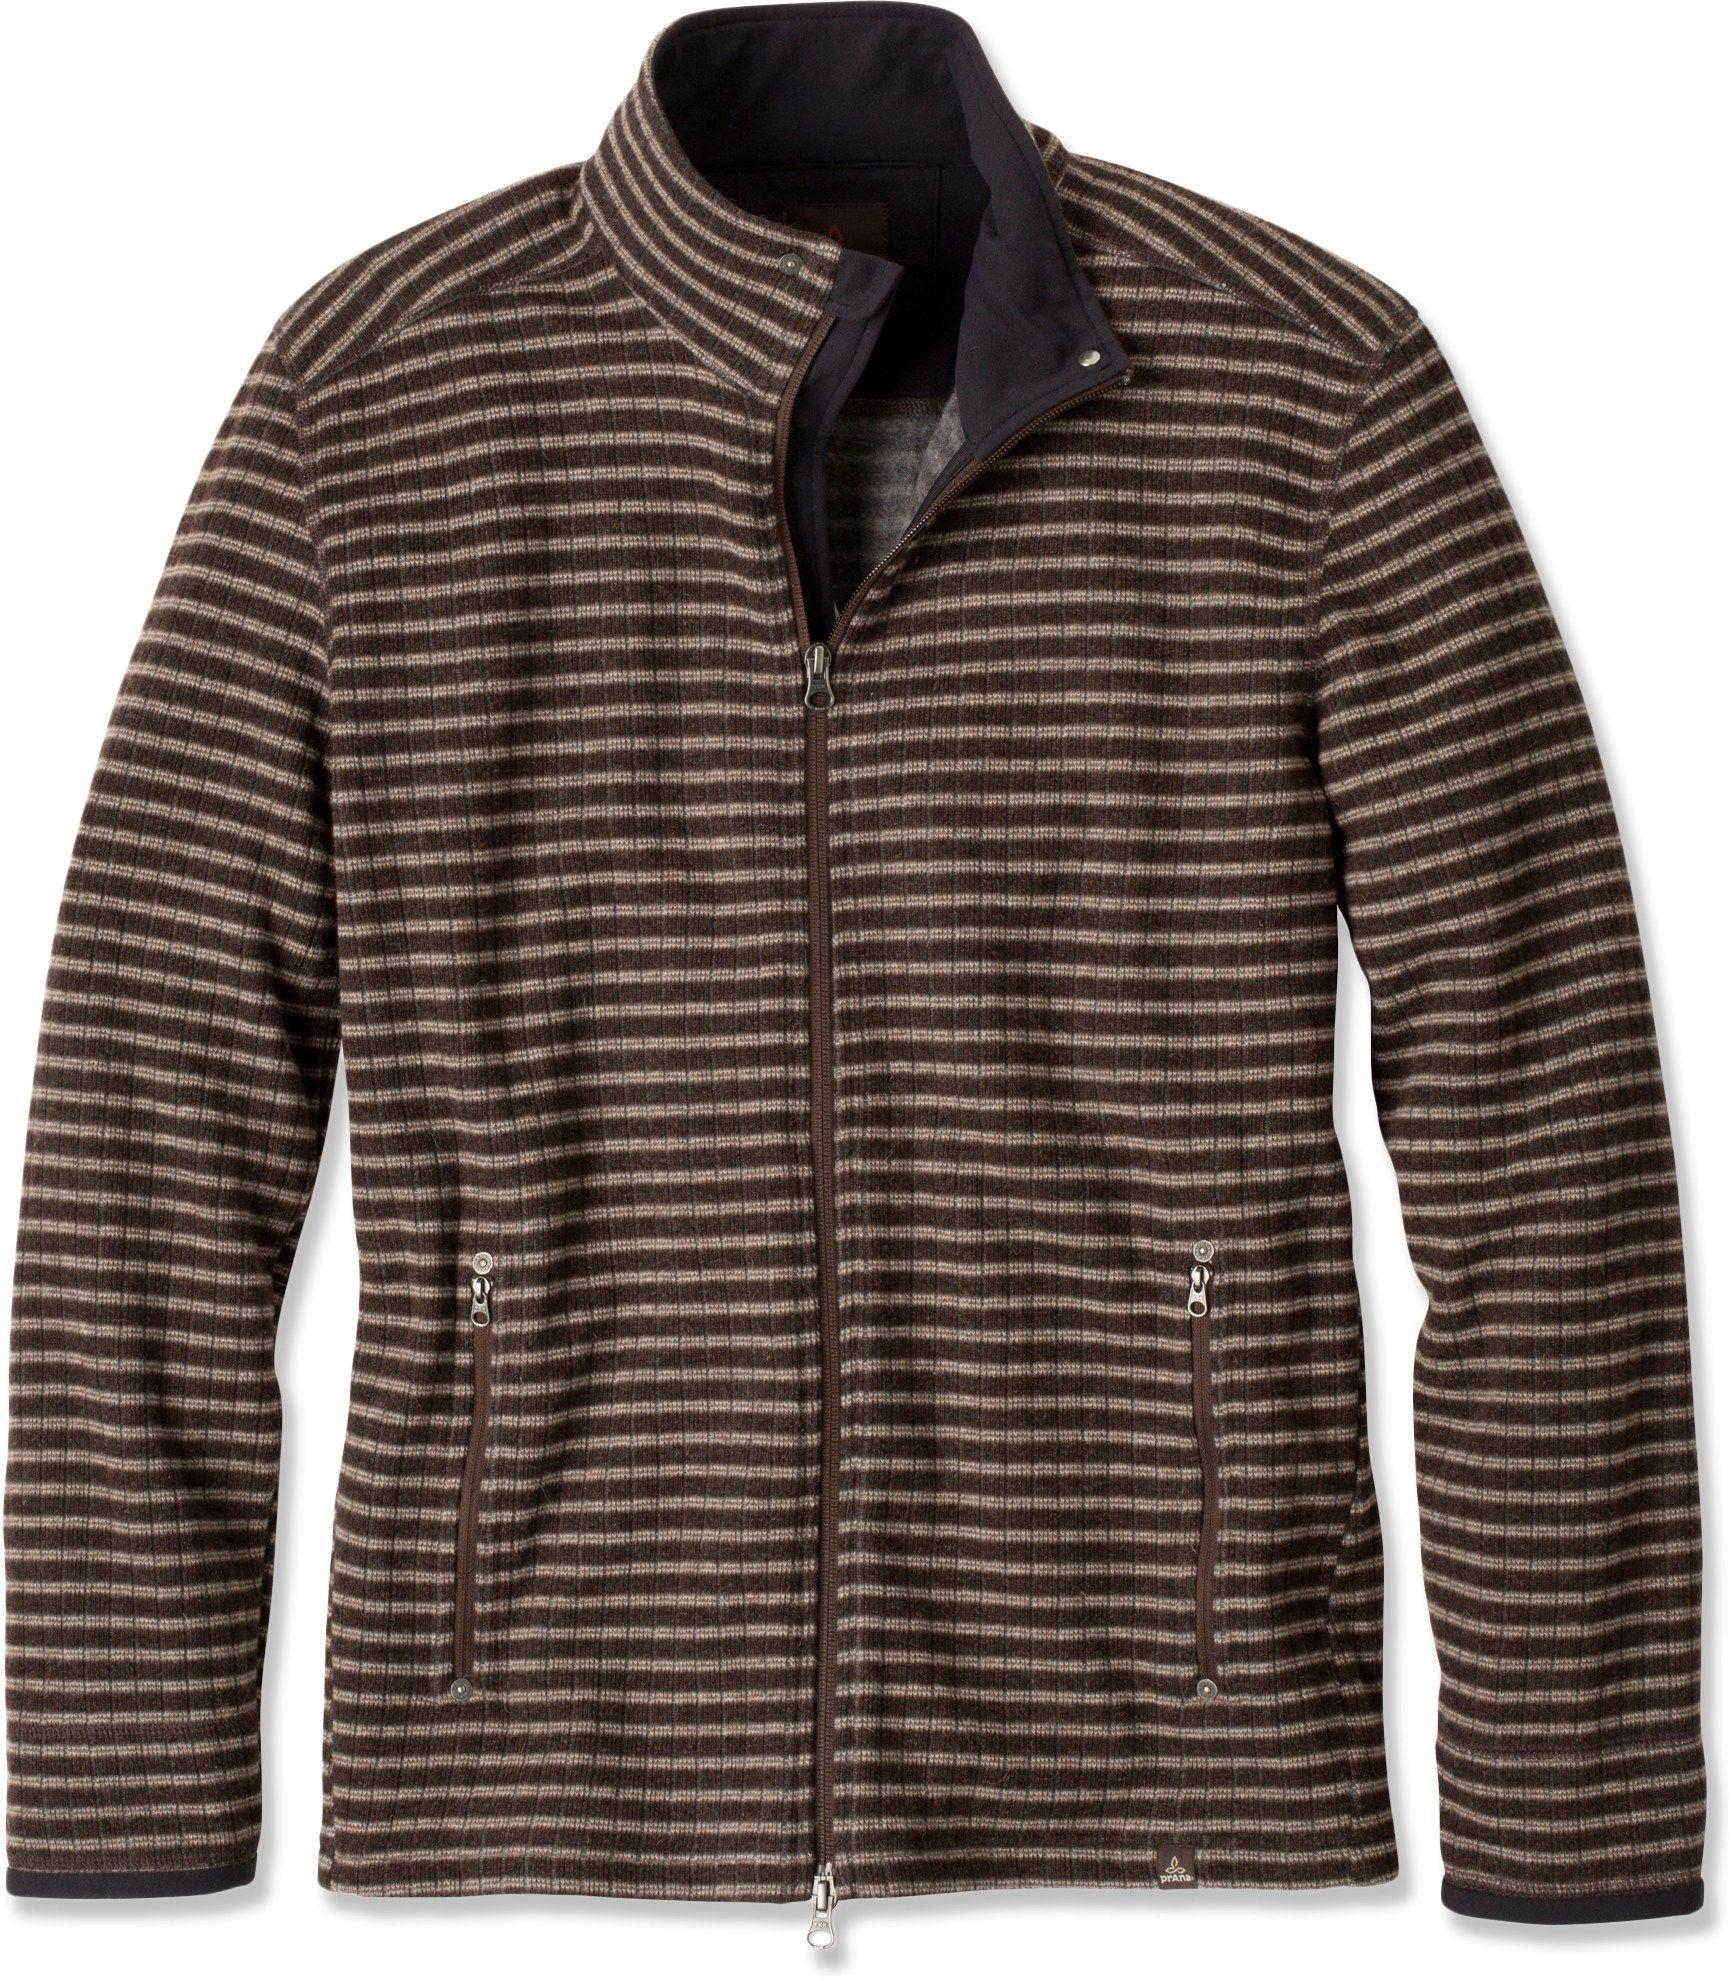 Prana Male Barclay Sweater - Men's